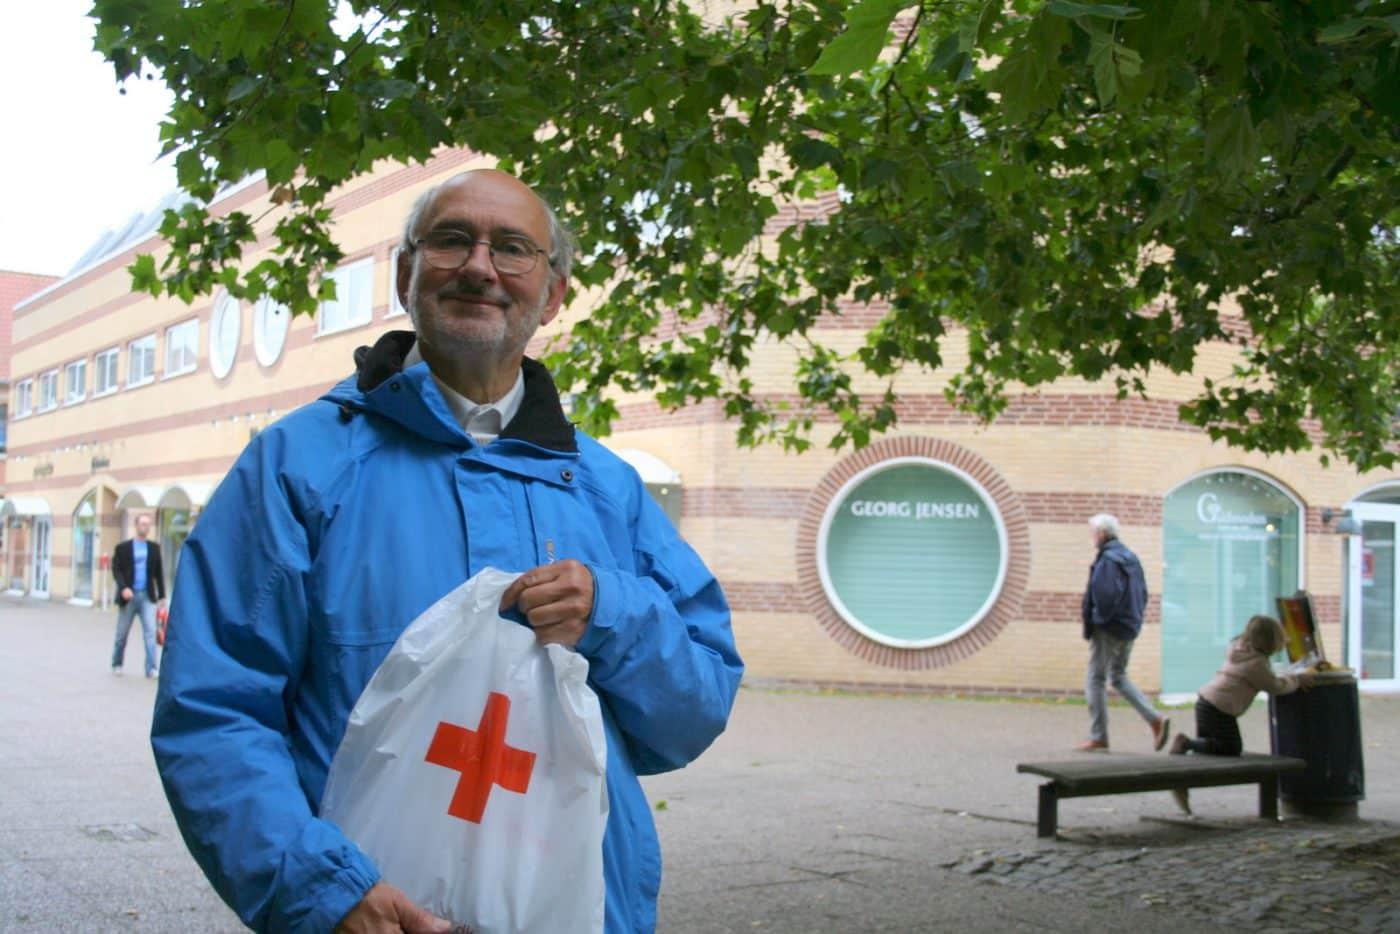 Landsindsamling 2016: Ib Tune Olsen satte rekord med hele 2.702 kroner i bøssen